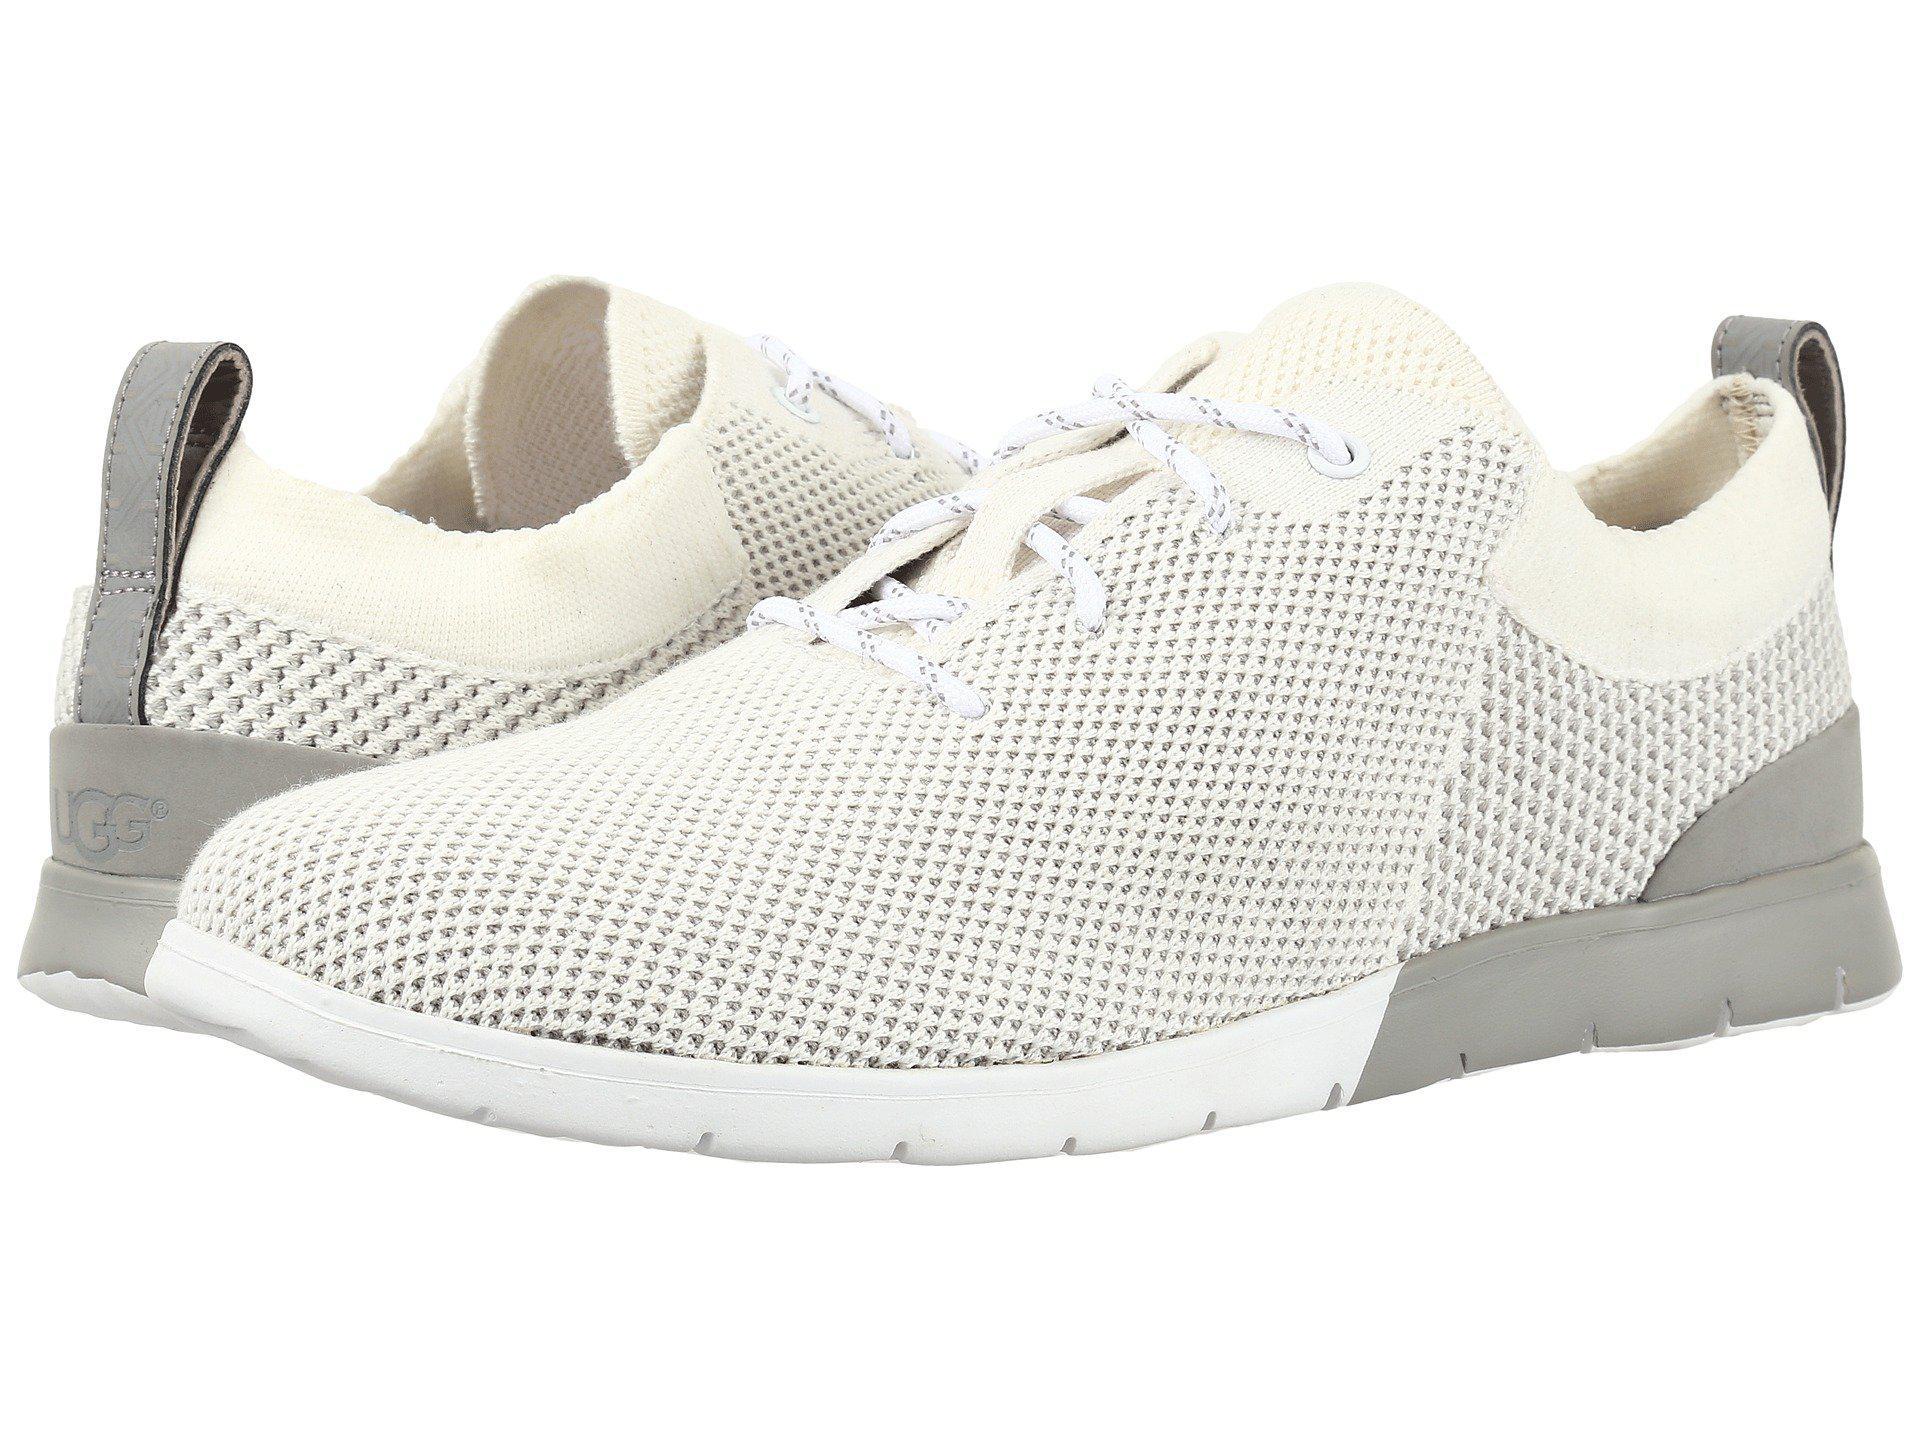 UGG Men's Feli Hyperweave Knit Lace Up Sneakers Vxi1b4EH